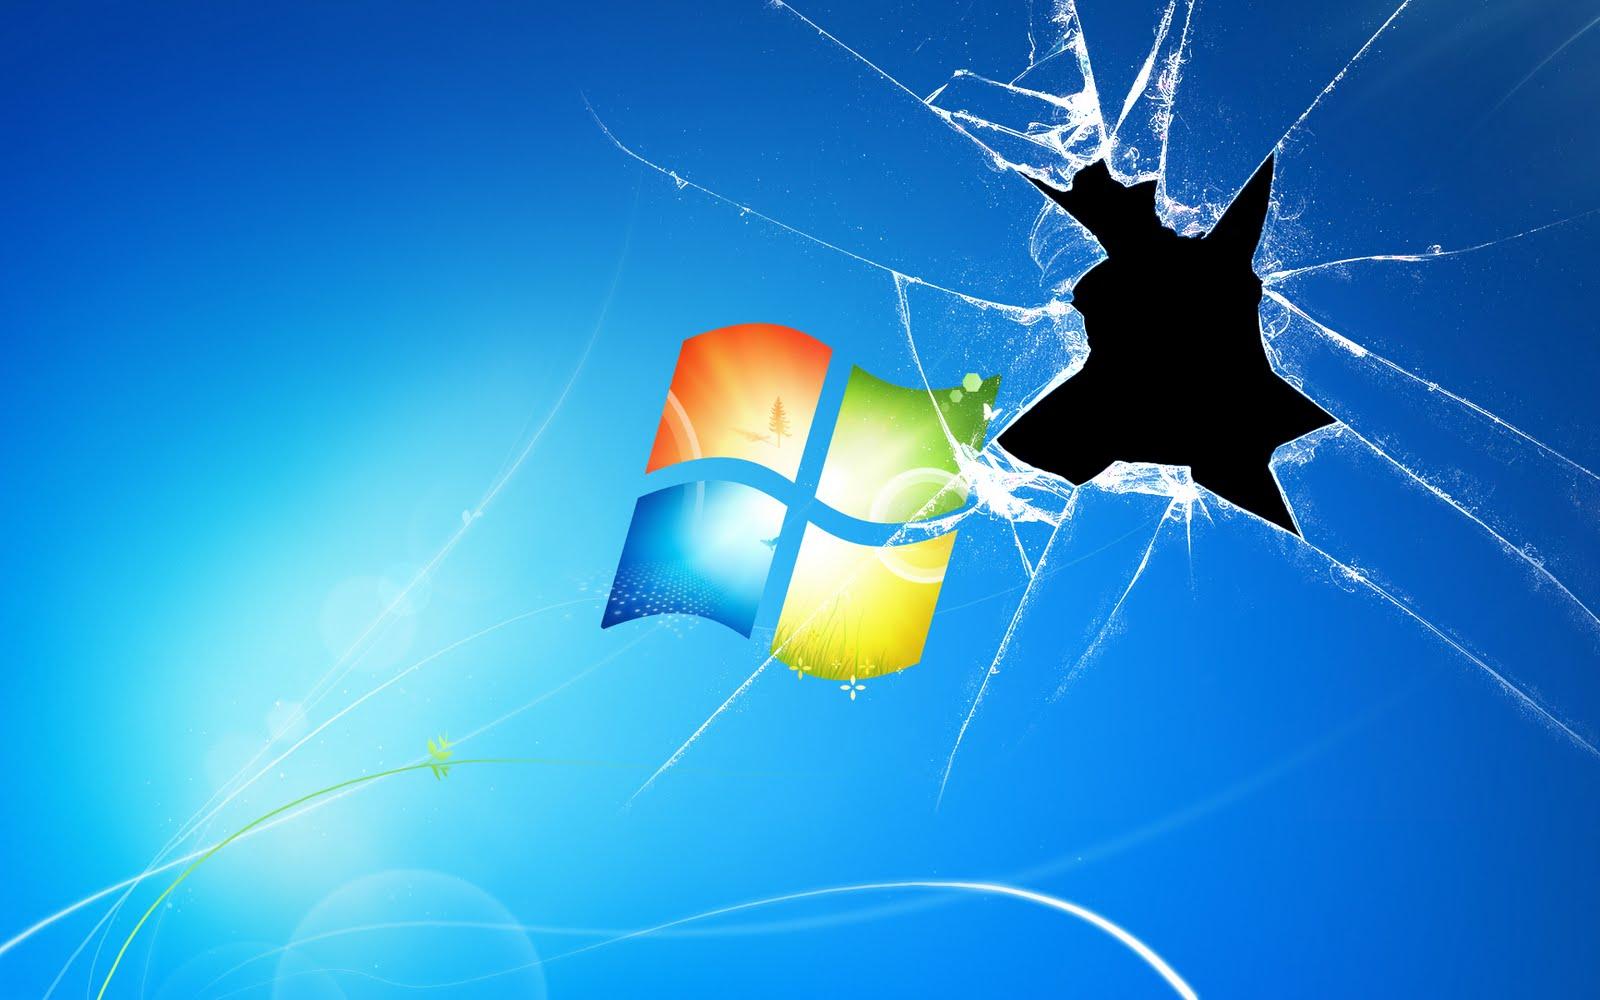 http://1.bp.blogspot.com/-oIpQbiHBas0/UJPH4rMoa4I/AAAAAAAABIs/OtC-bmoQZ7k/s1600/Broken_Windows7.jpg